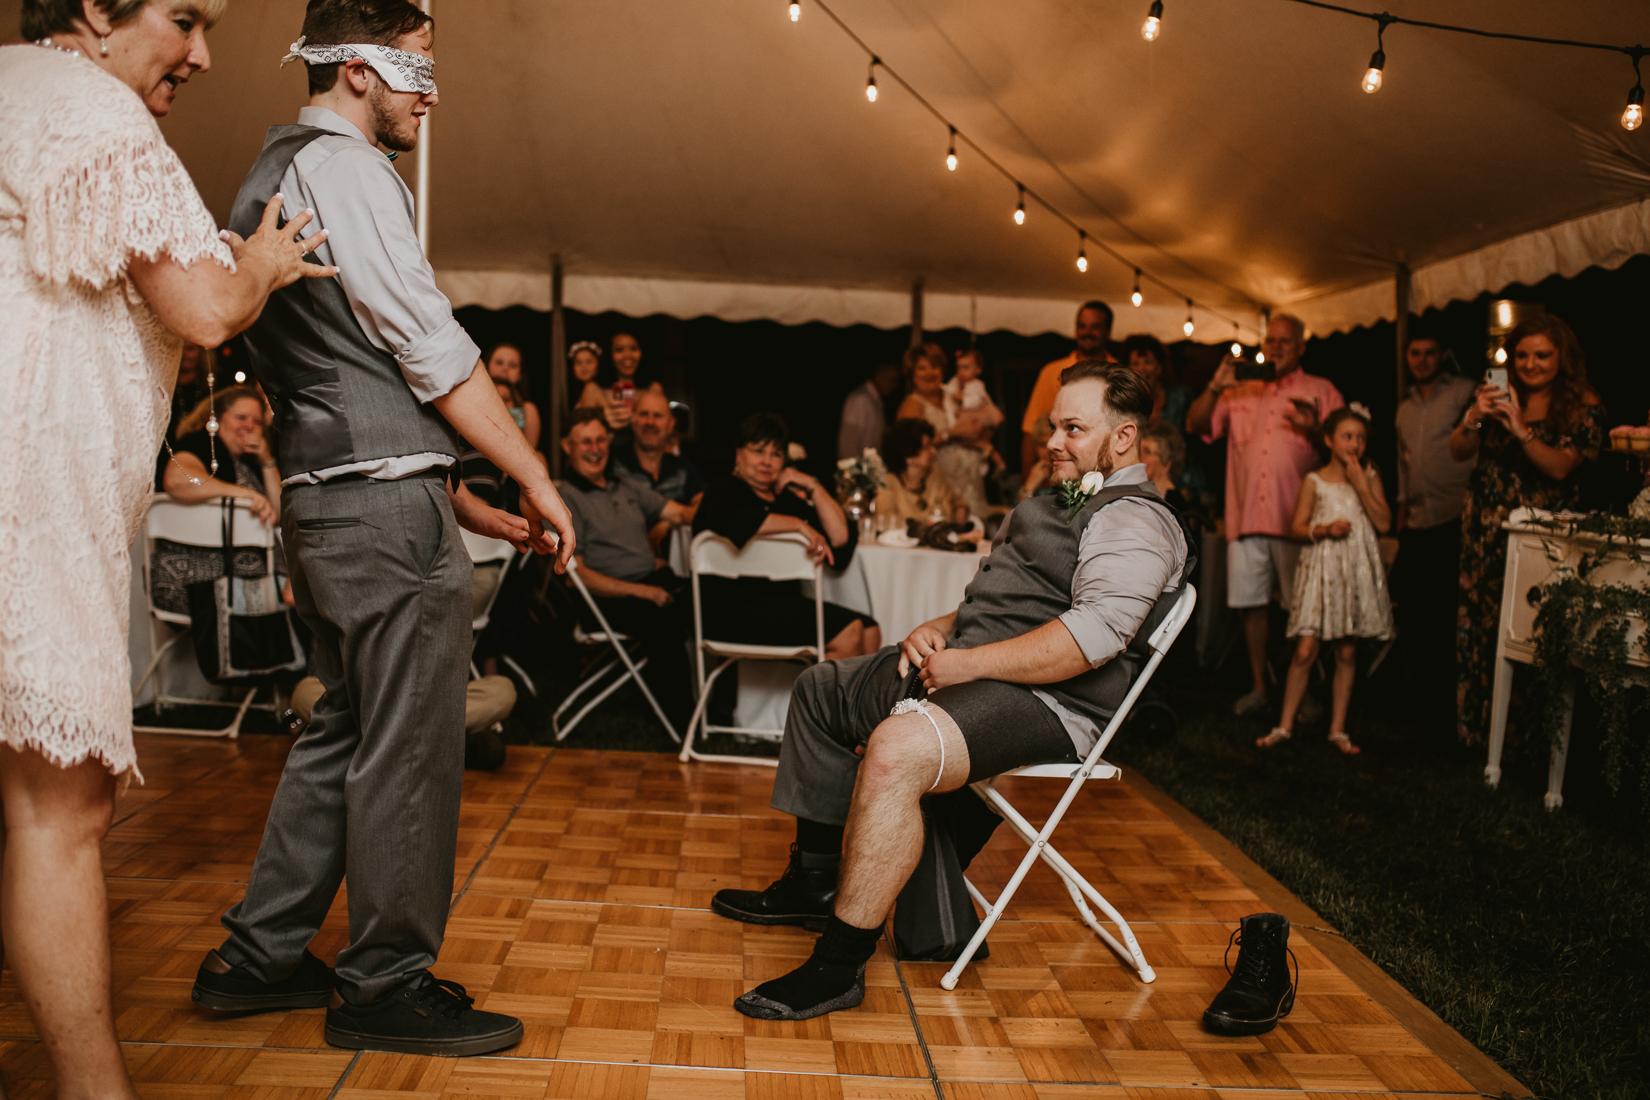 olivia_zay_wedding_09_2018-9100.jpg